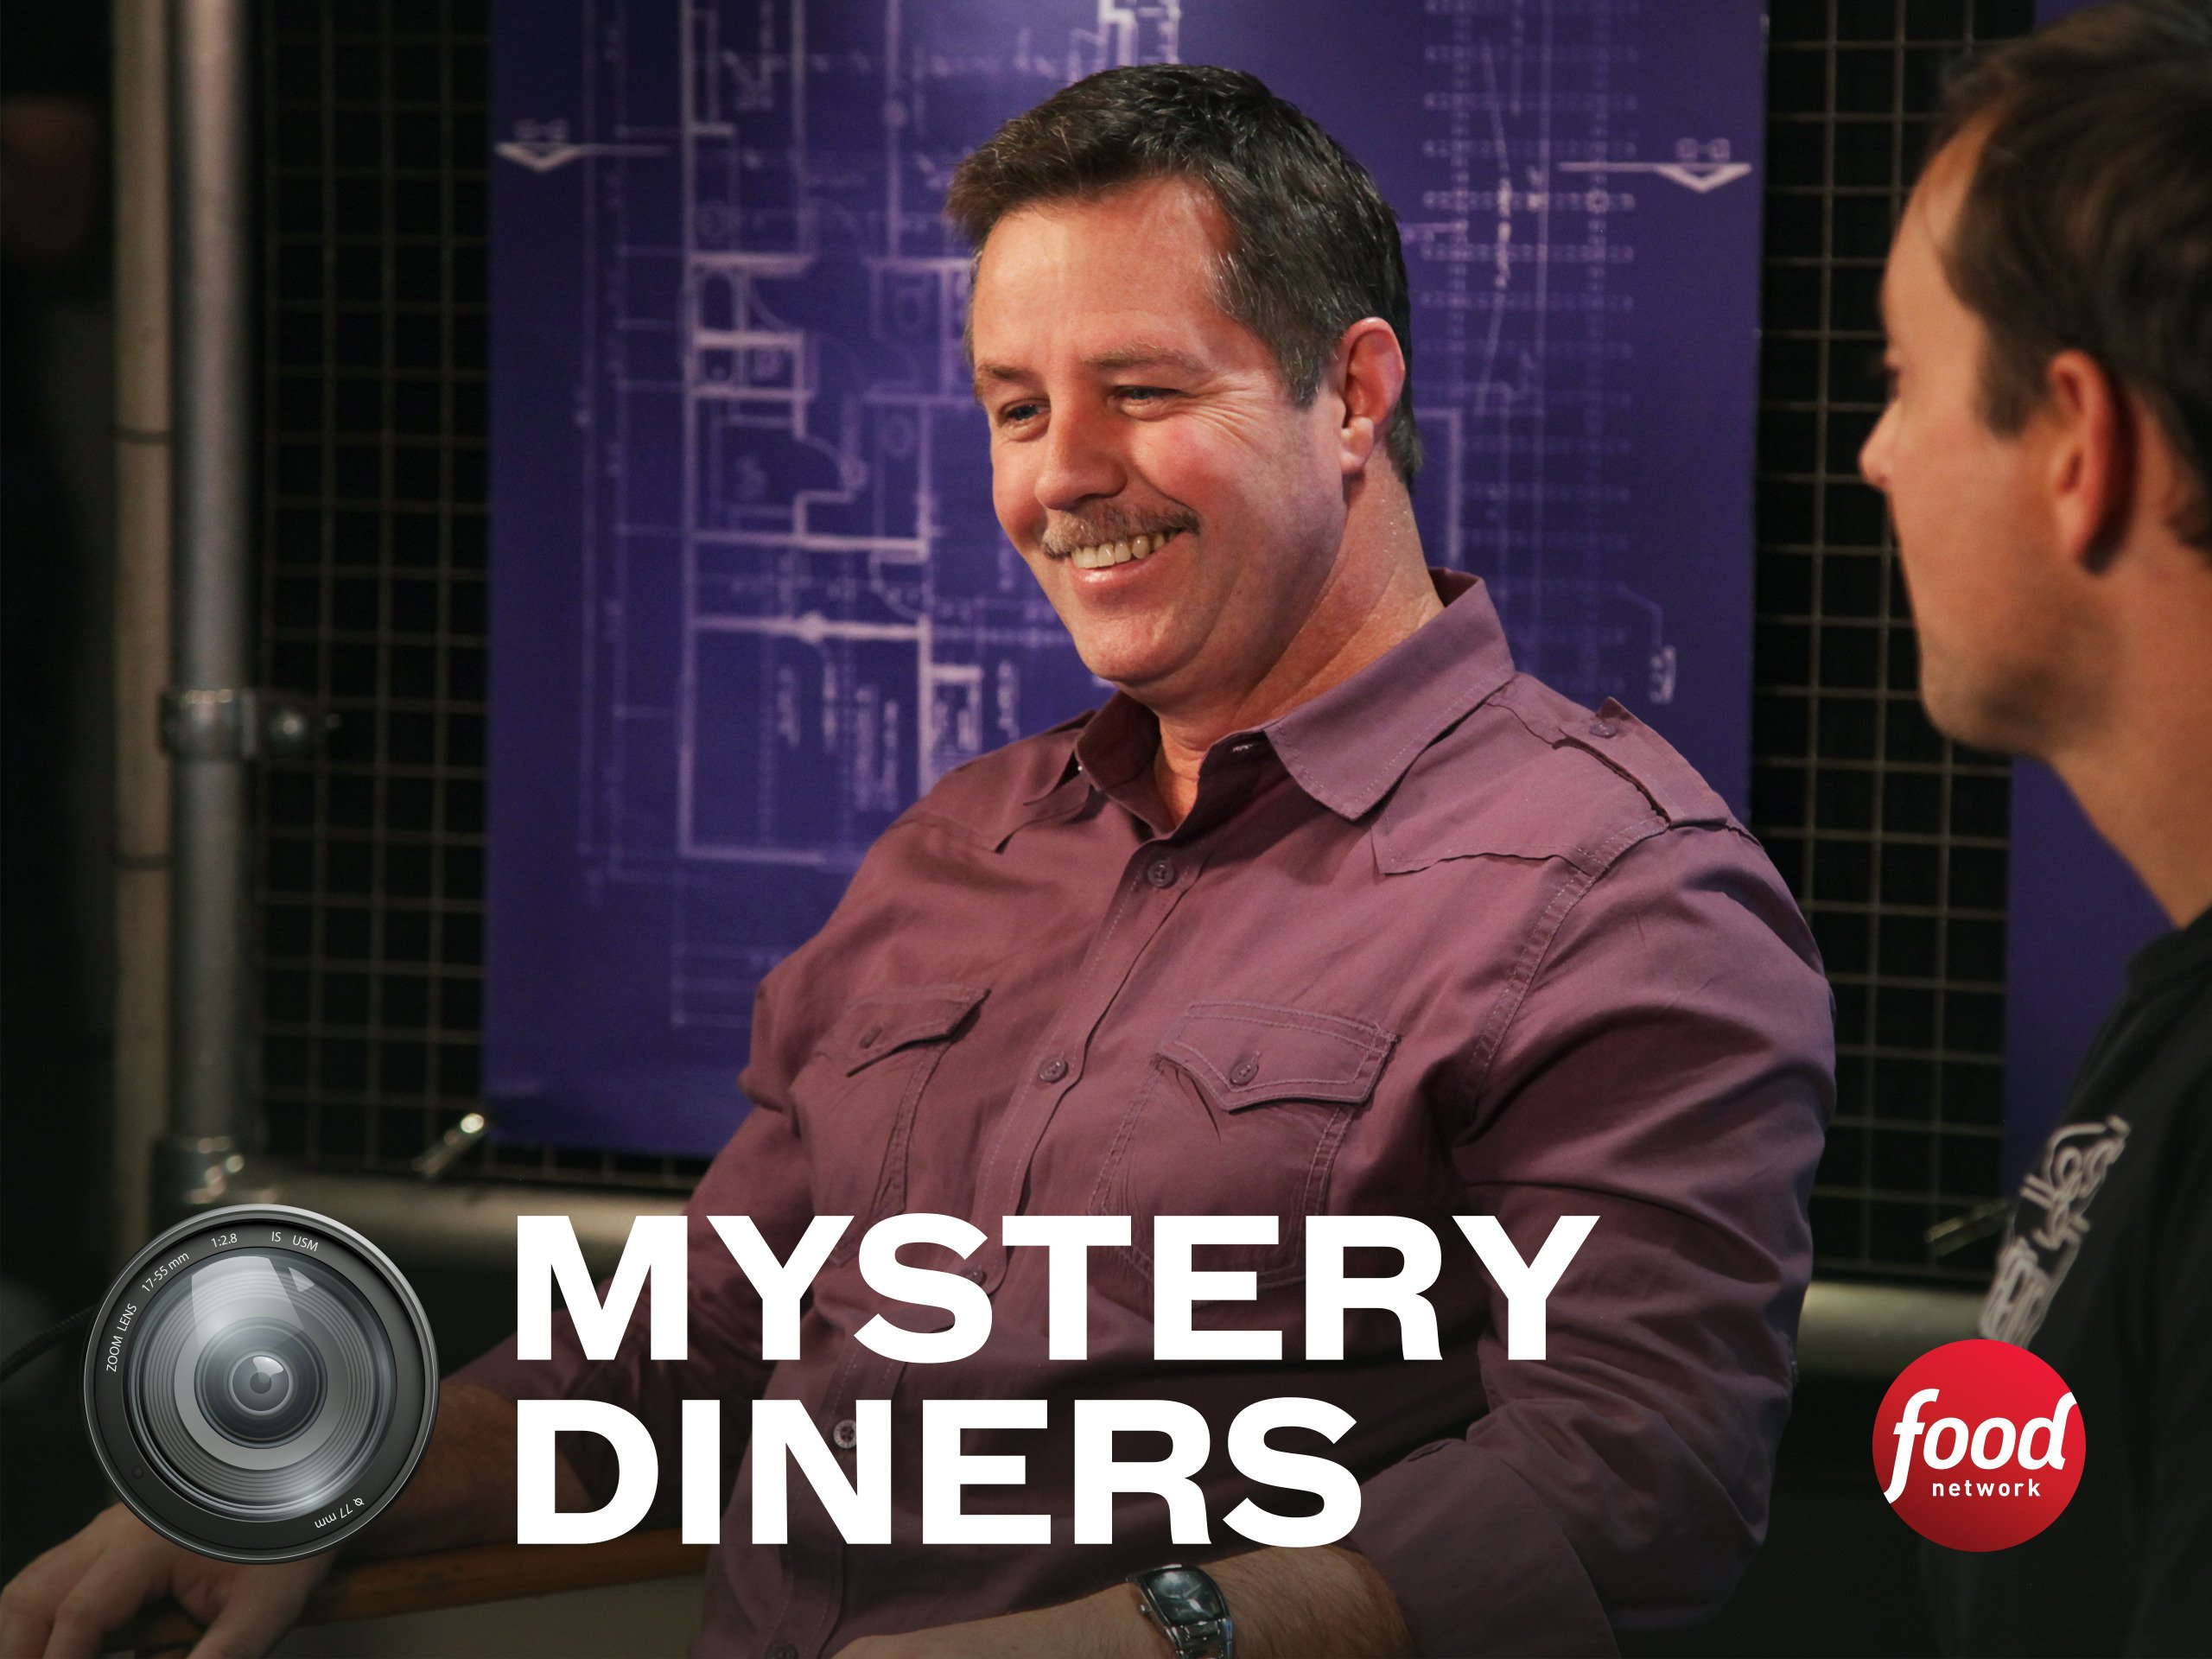 watch mystery diners season 2 online free